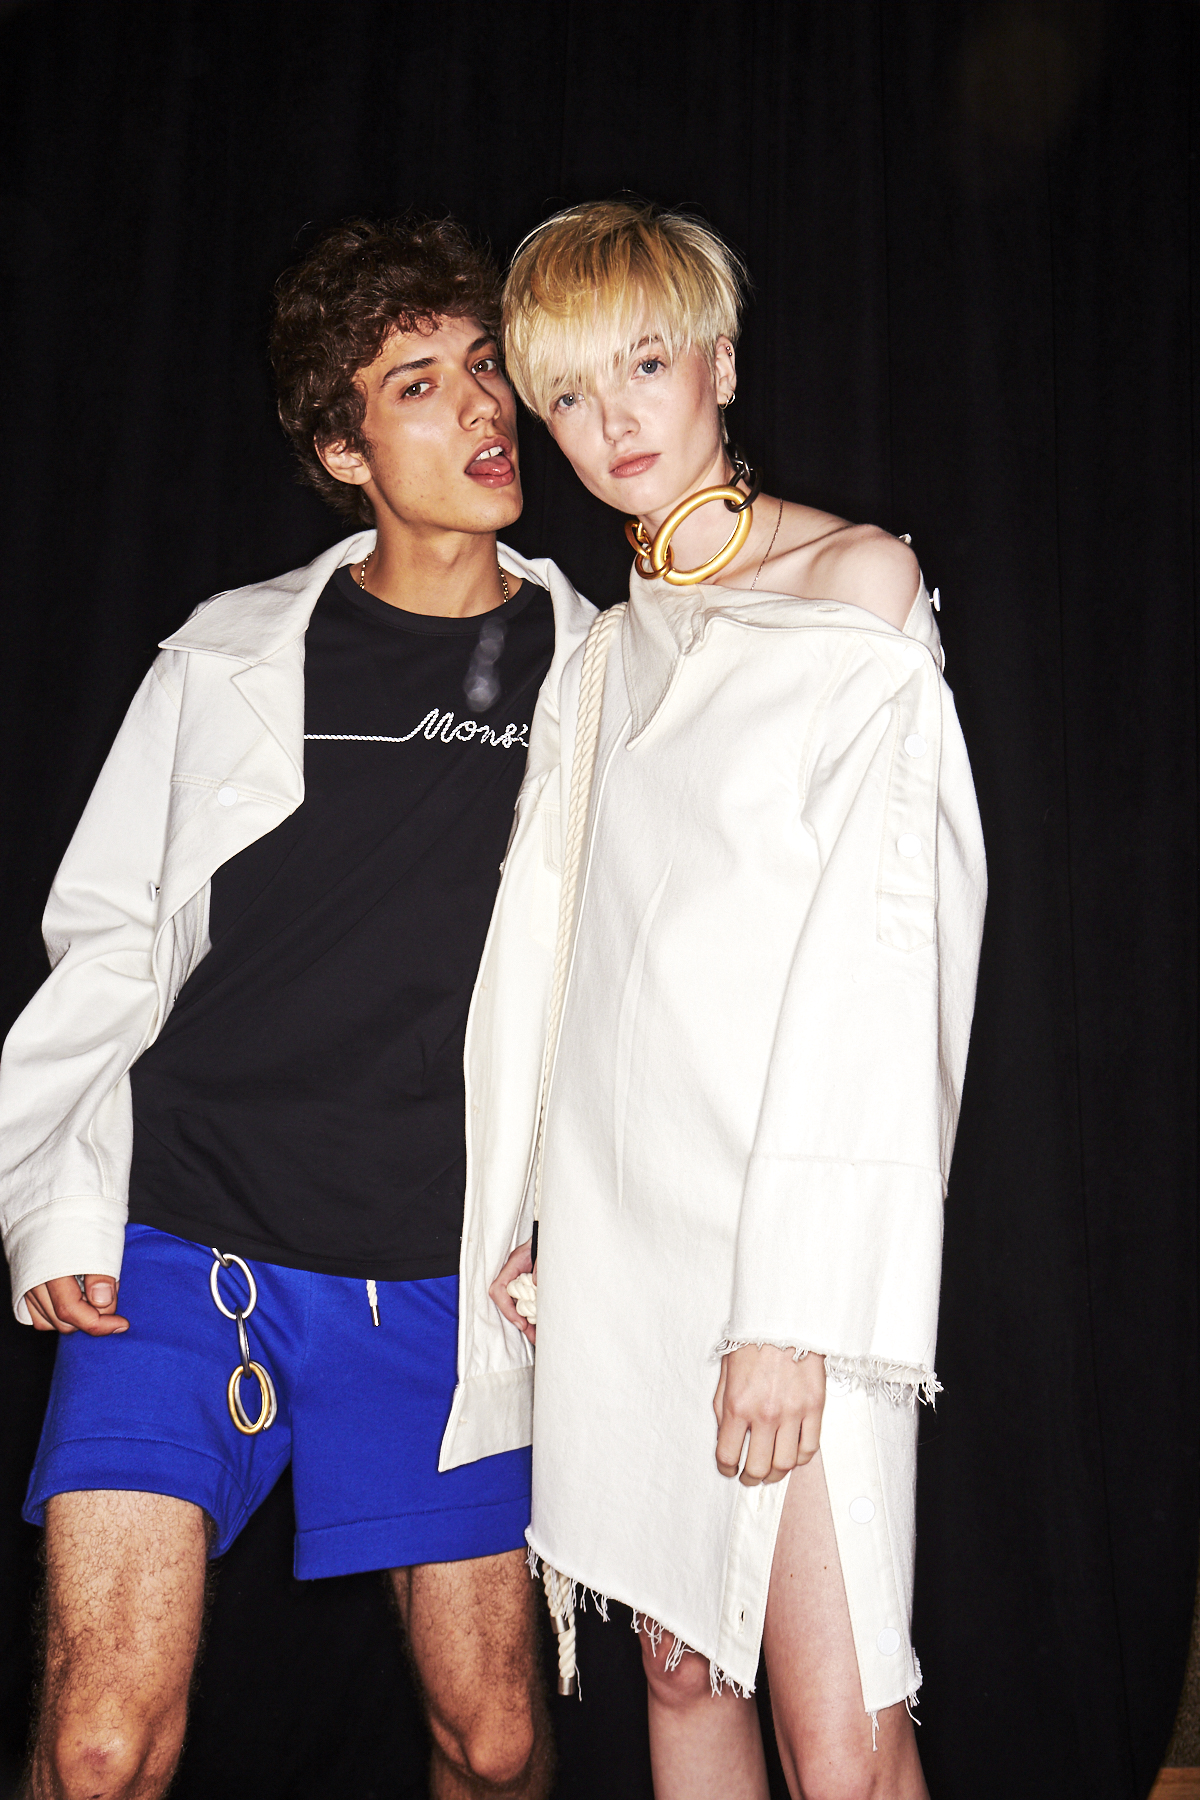 Monse SS19 Fashion Show New York Backstage